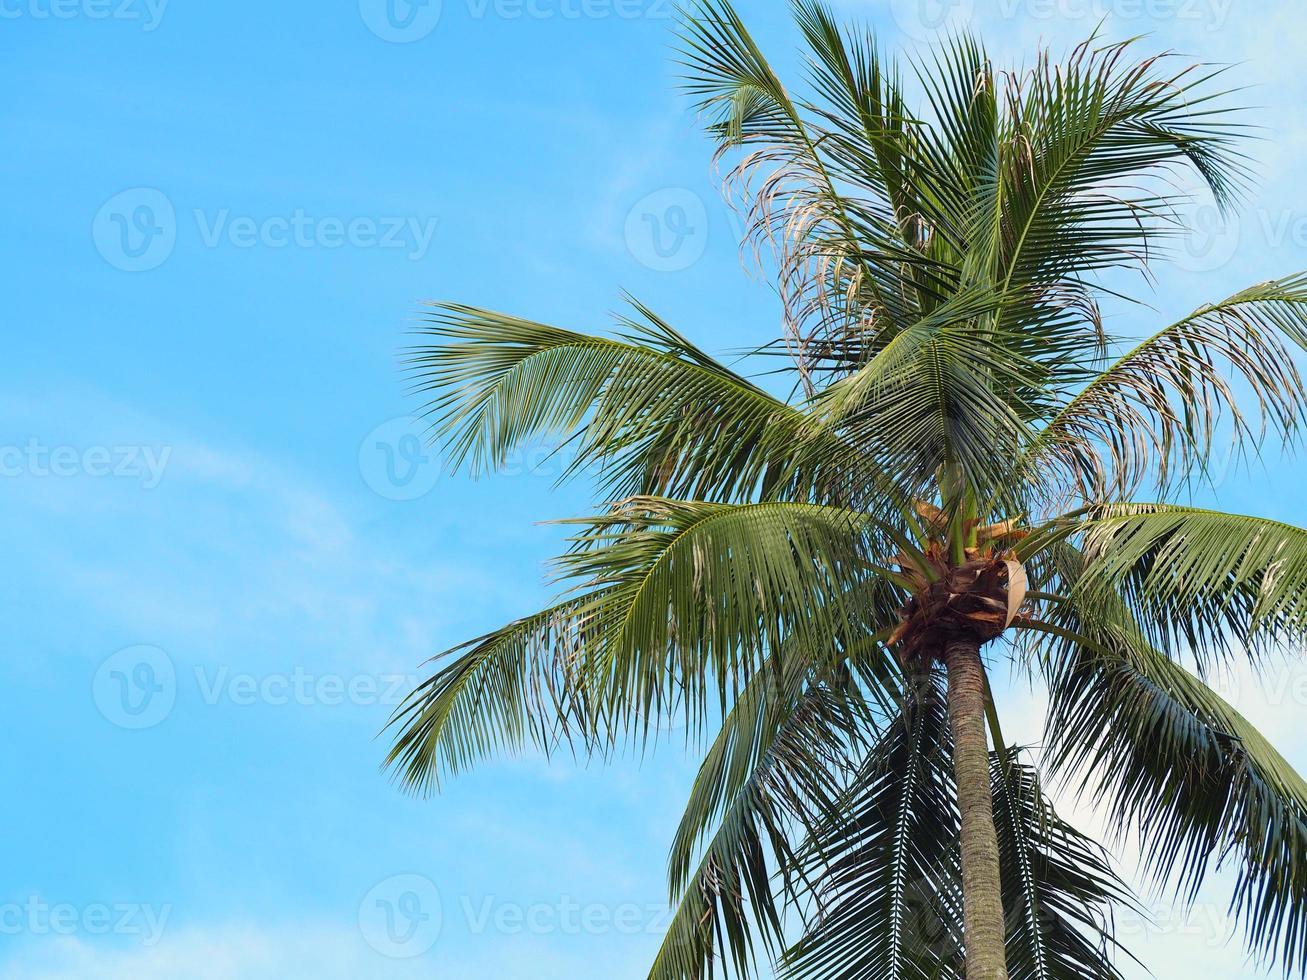 Coconut trees in the tropics photo